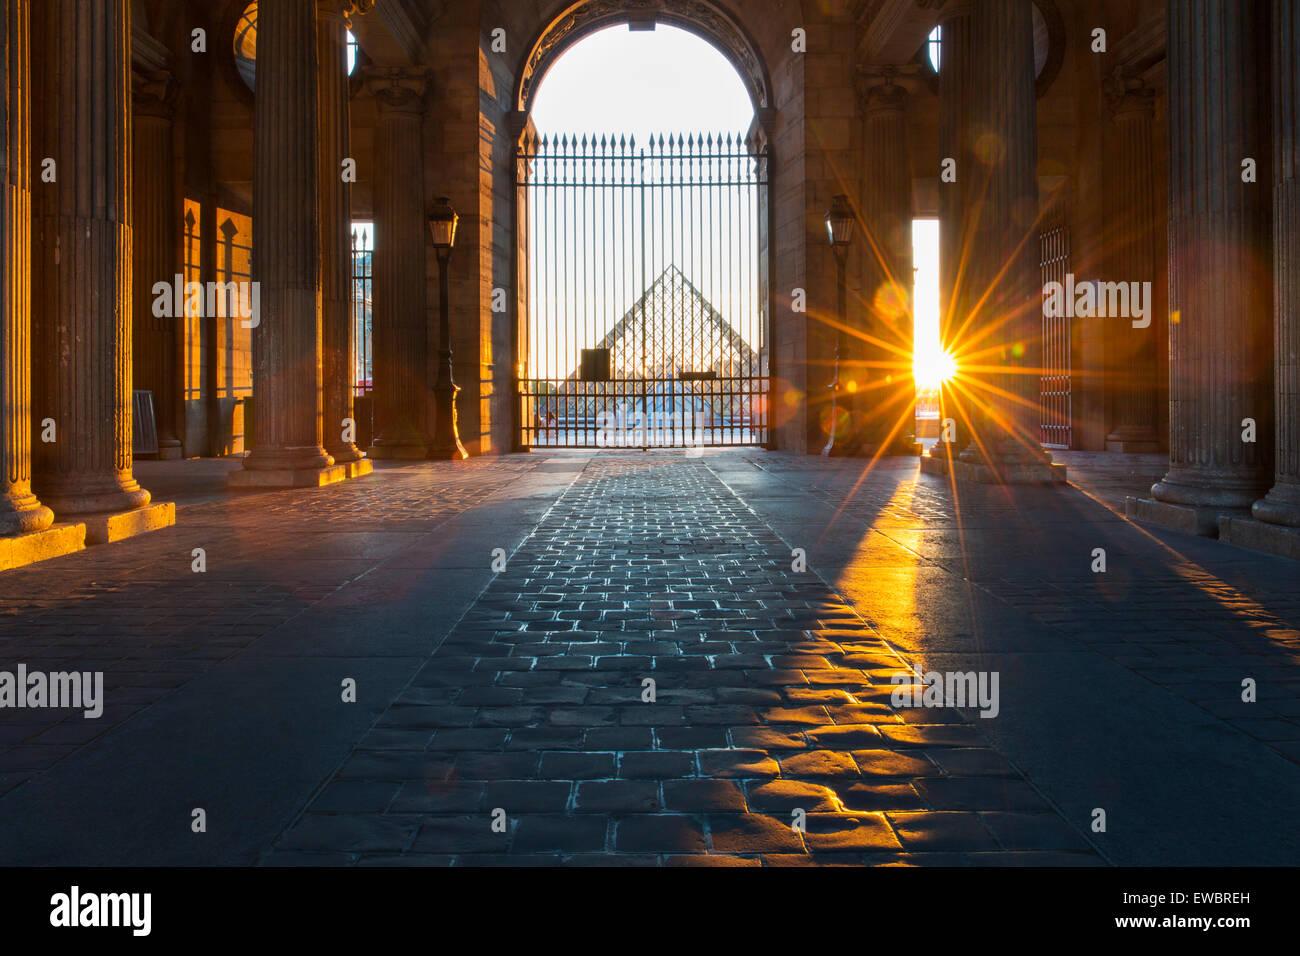 Sonnenuntergang bei gated Eintrag du Louvre, Paris, Musée, Frankreich Stockbild